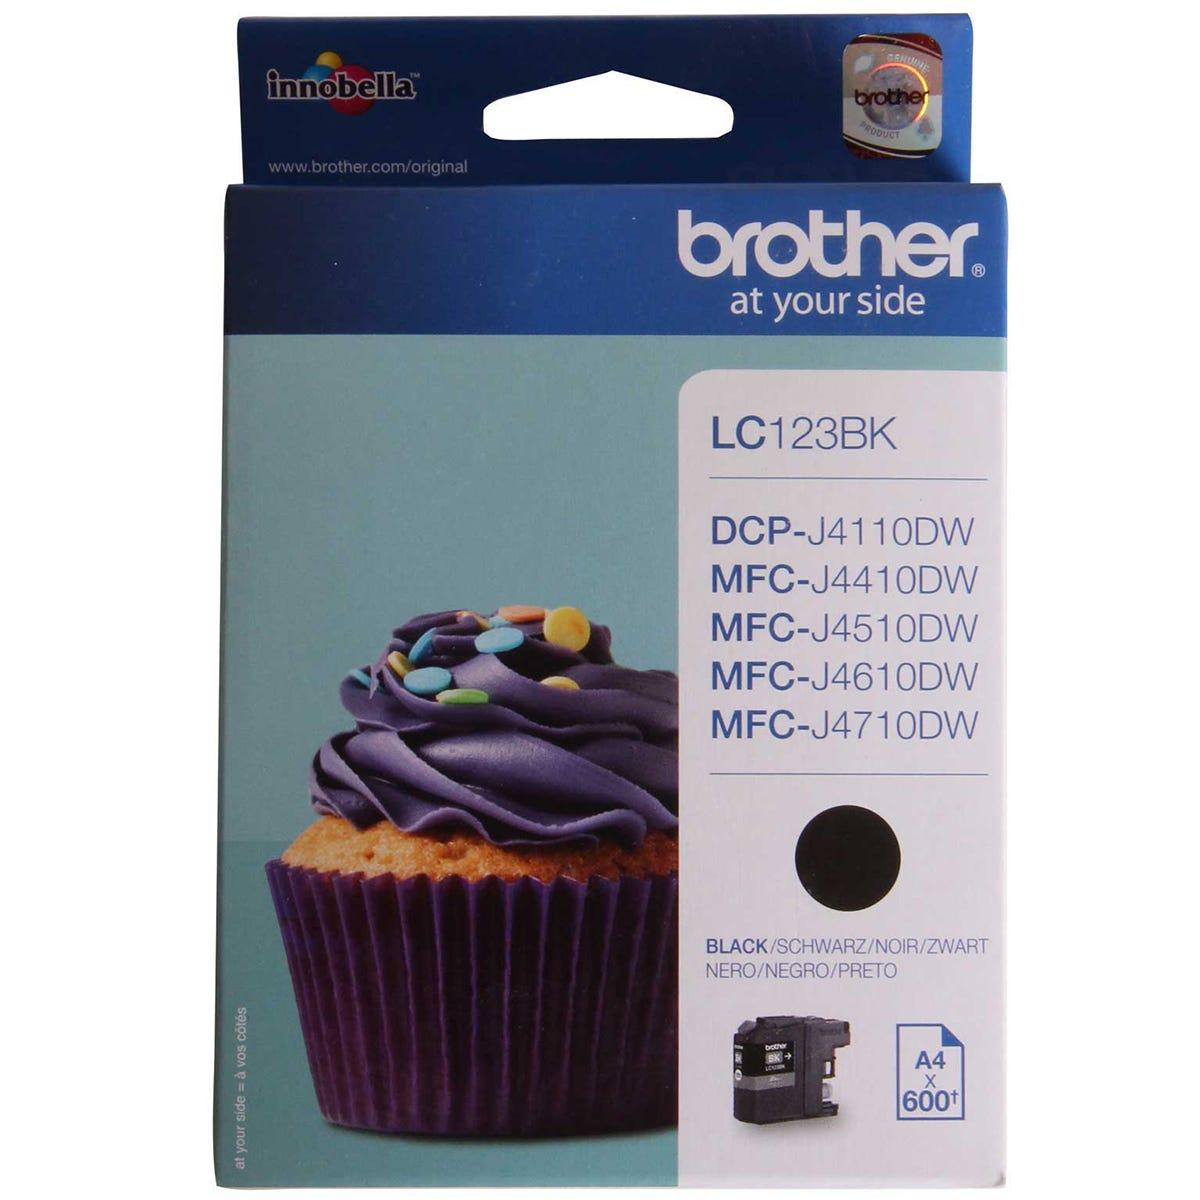 Image of Brother LC123 Ink Black Cartridge, Black